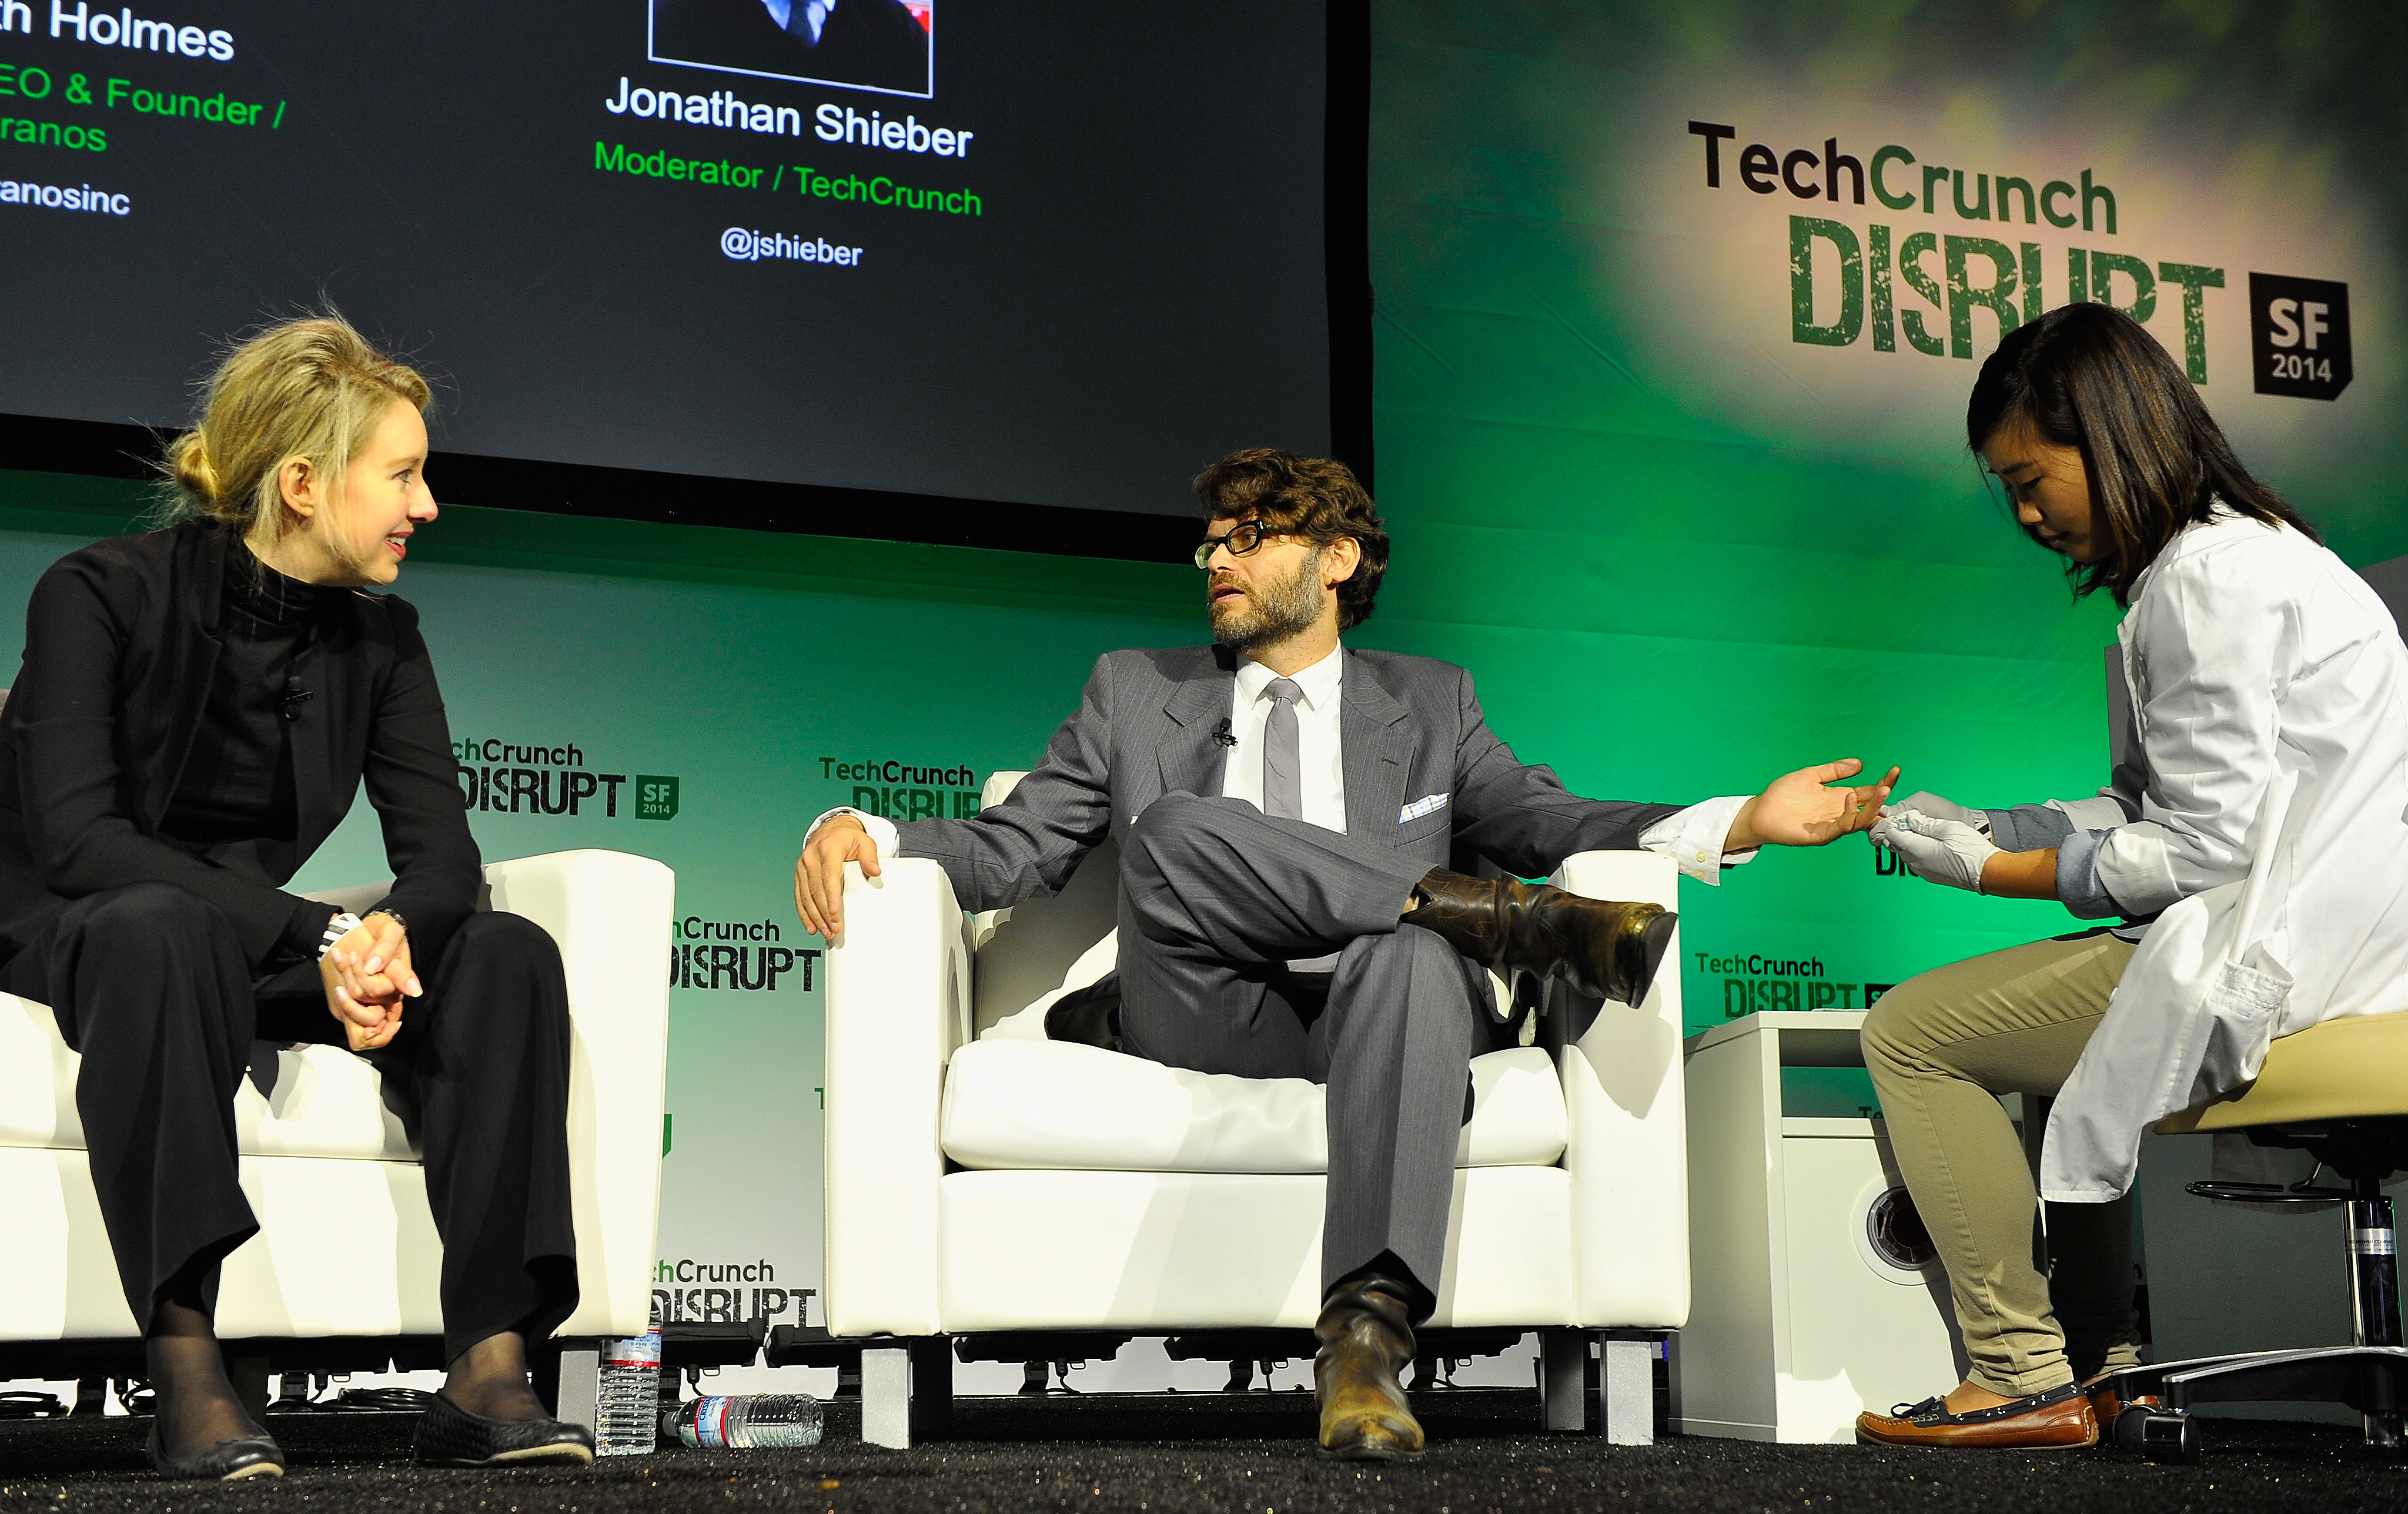 TechCrunch 2014 from flickr